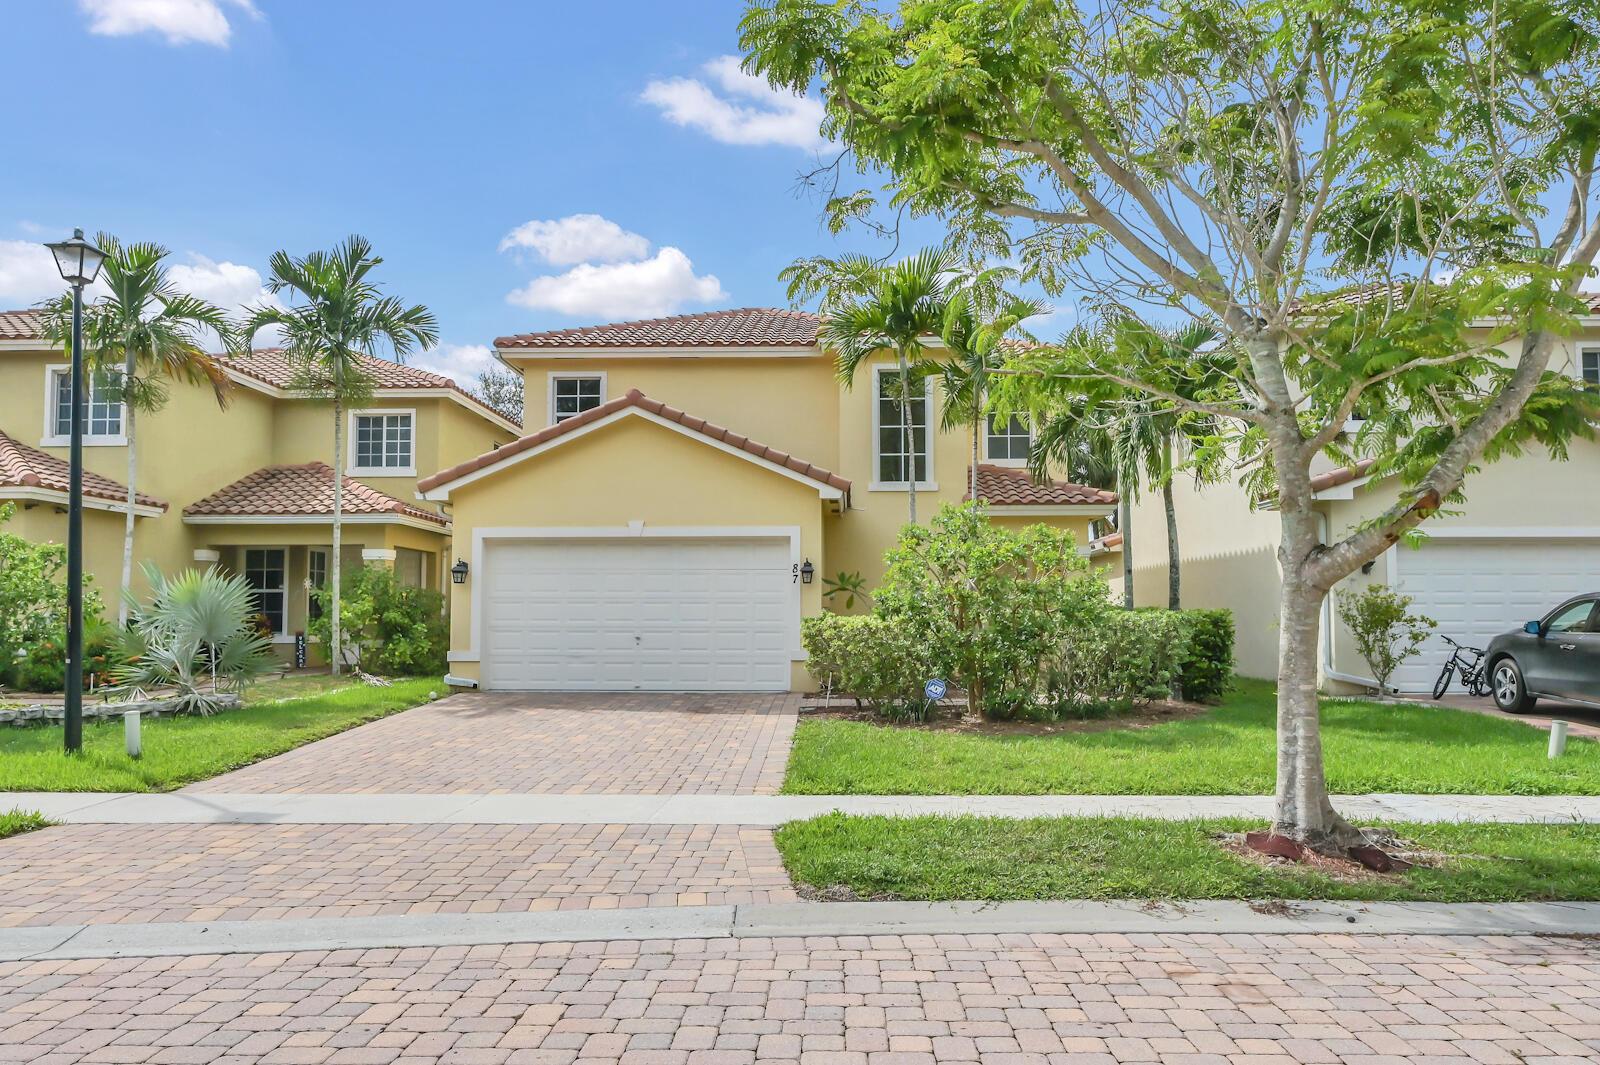 87 Atwell Drive West Palm Beach, FL 33411